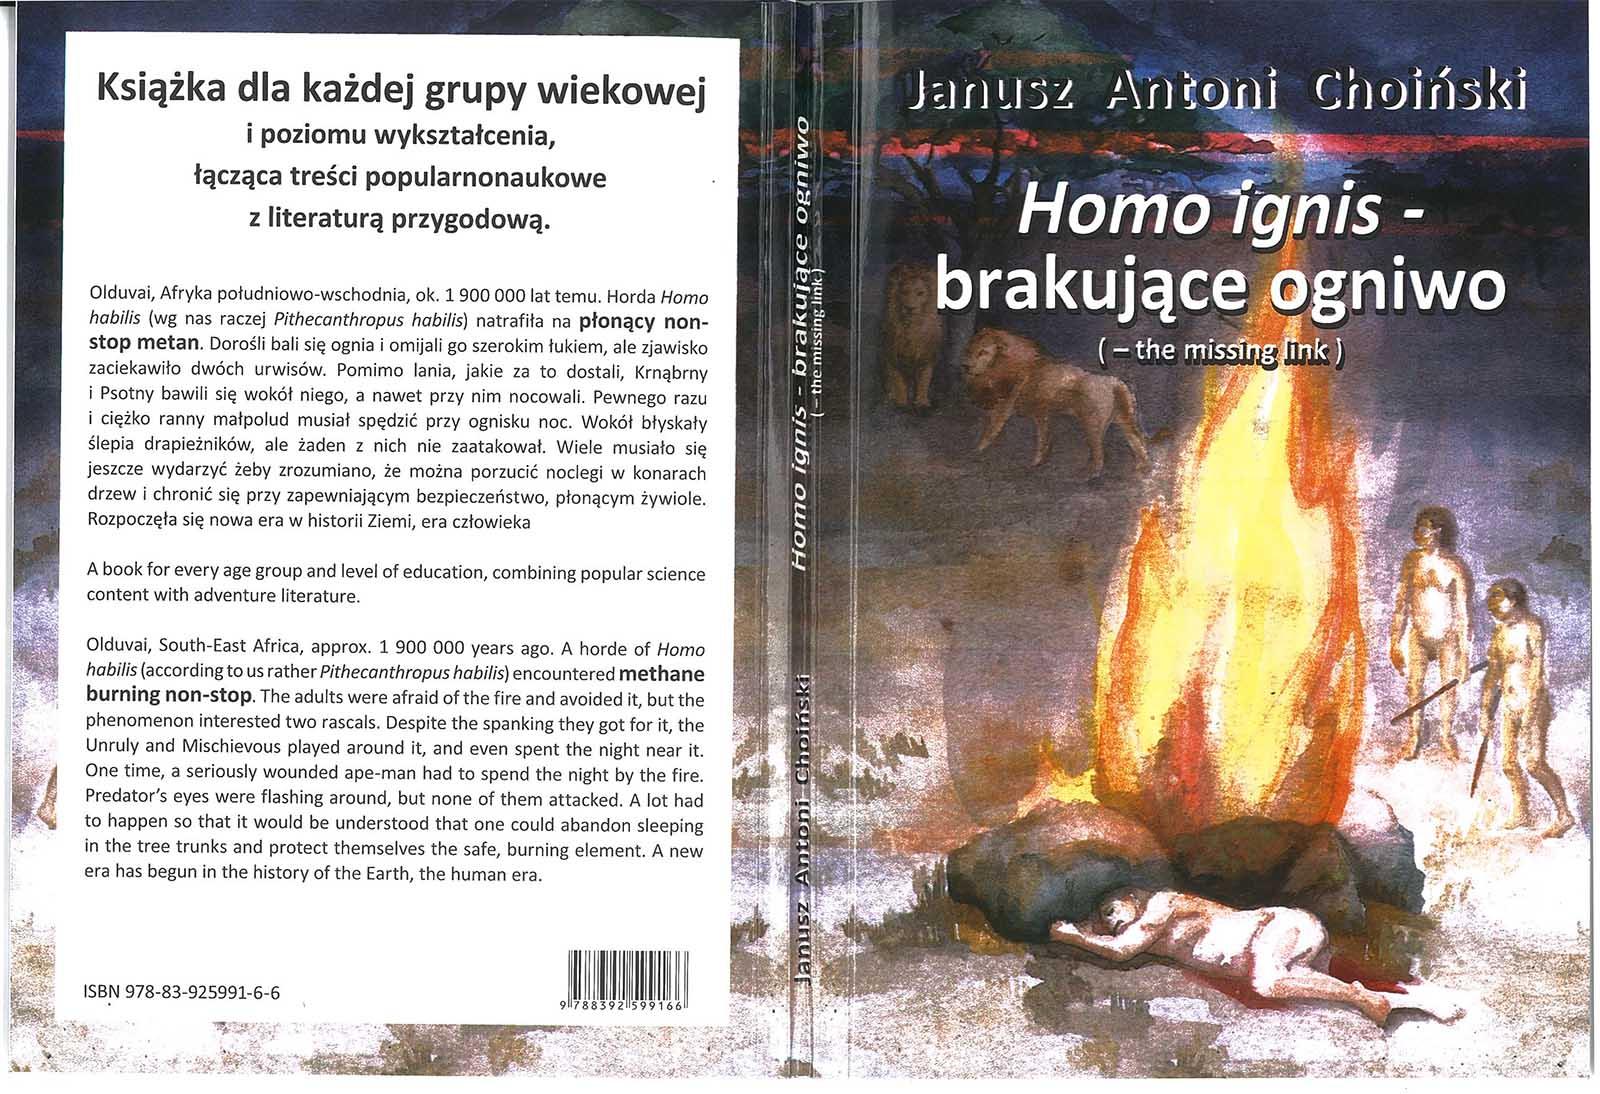 Homo ignis - brakujące ogniwo